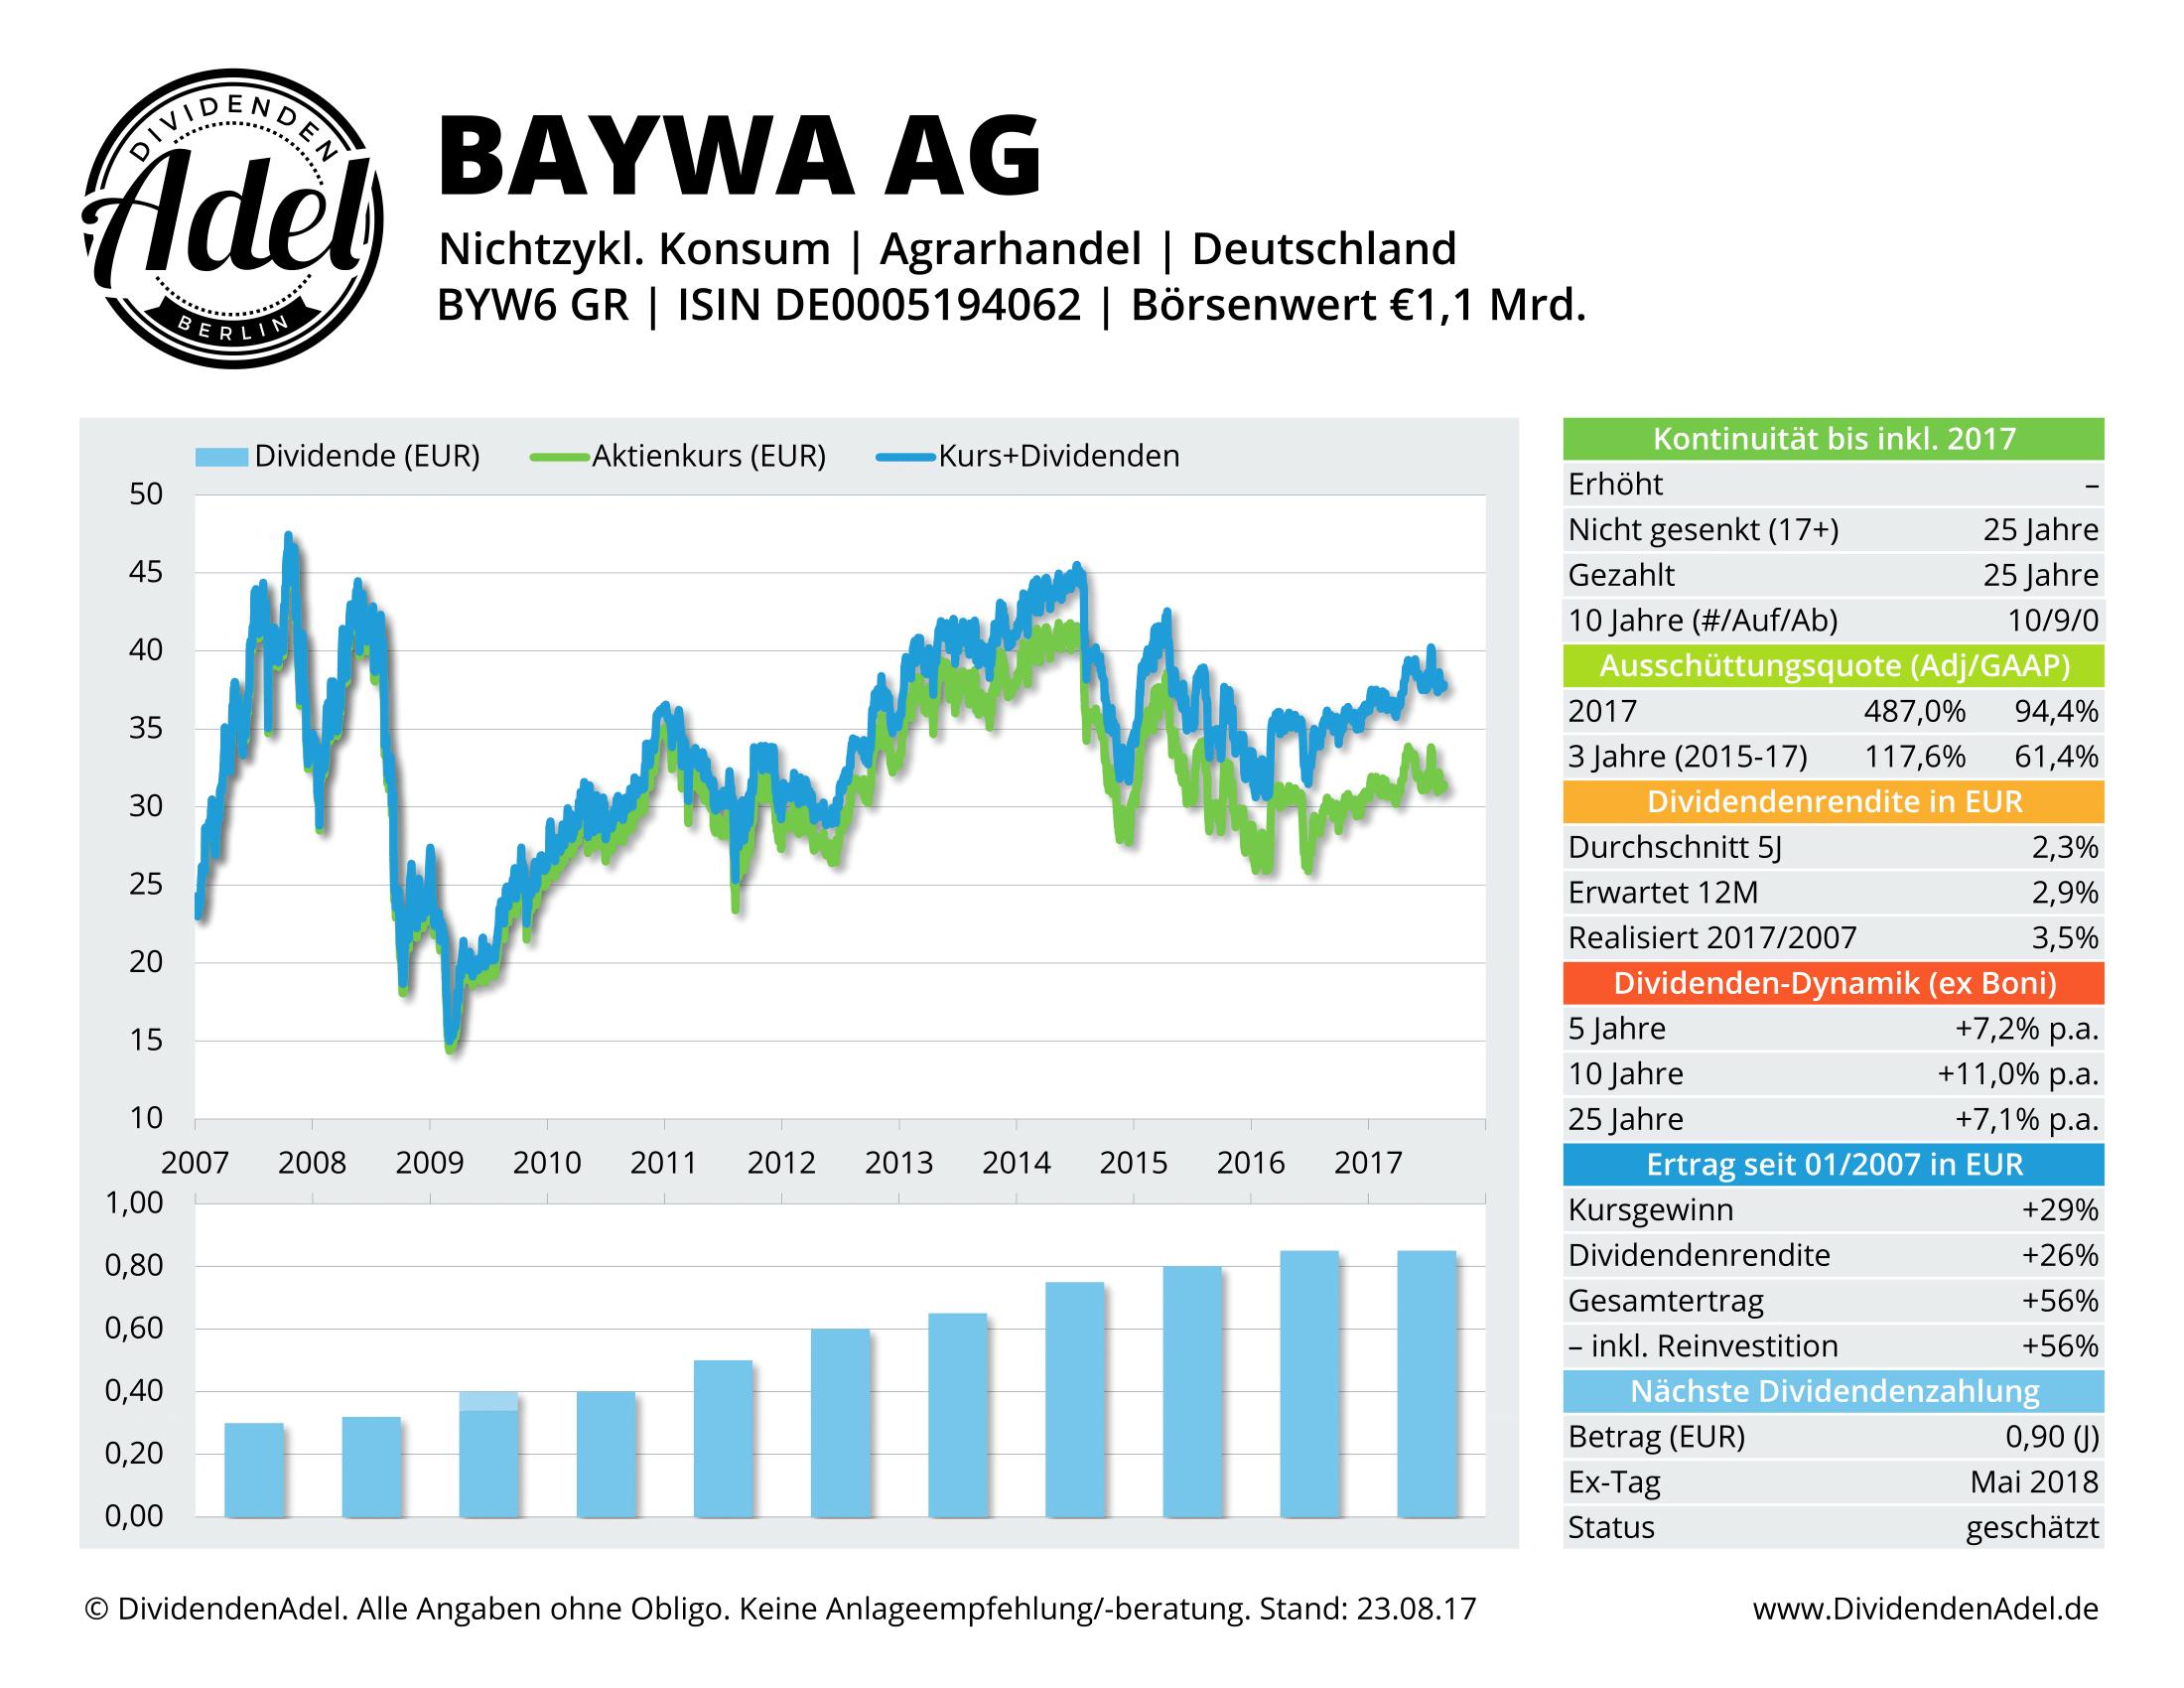 2017-08-23 35 BAYWA AG-VINK. DividendenAdel-Profil ab 2007-1